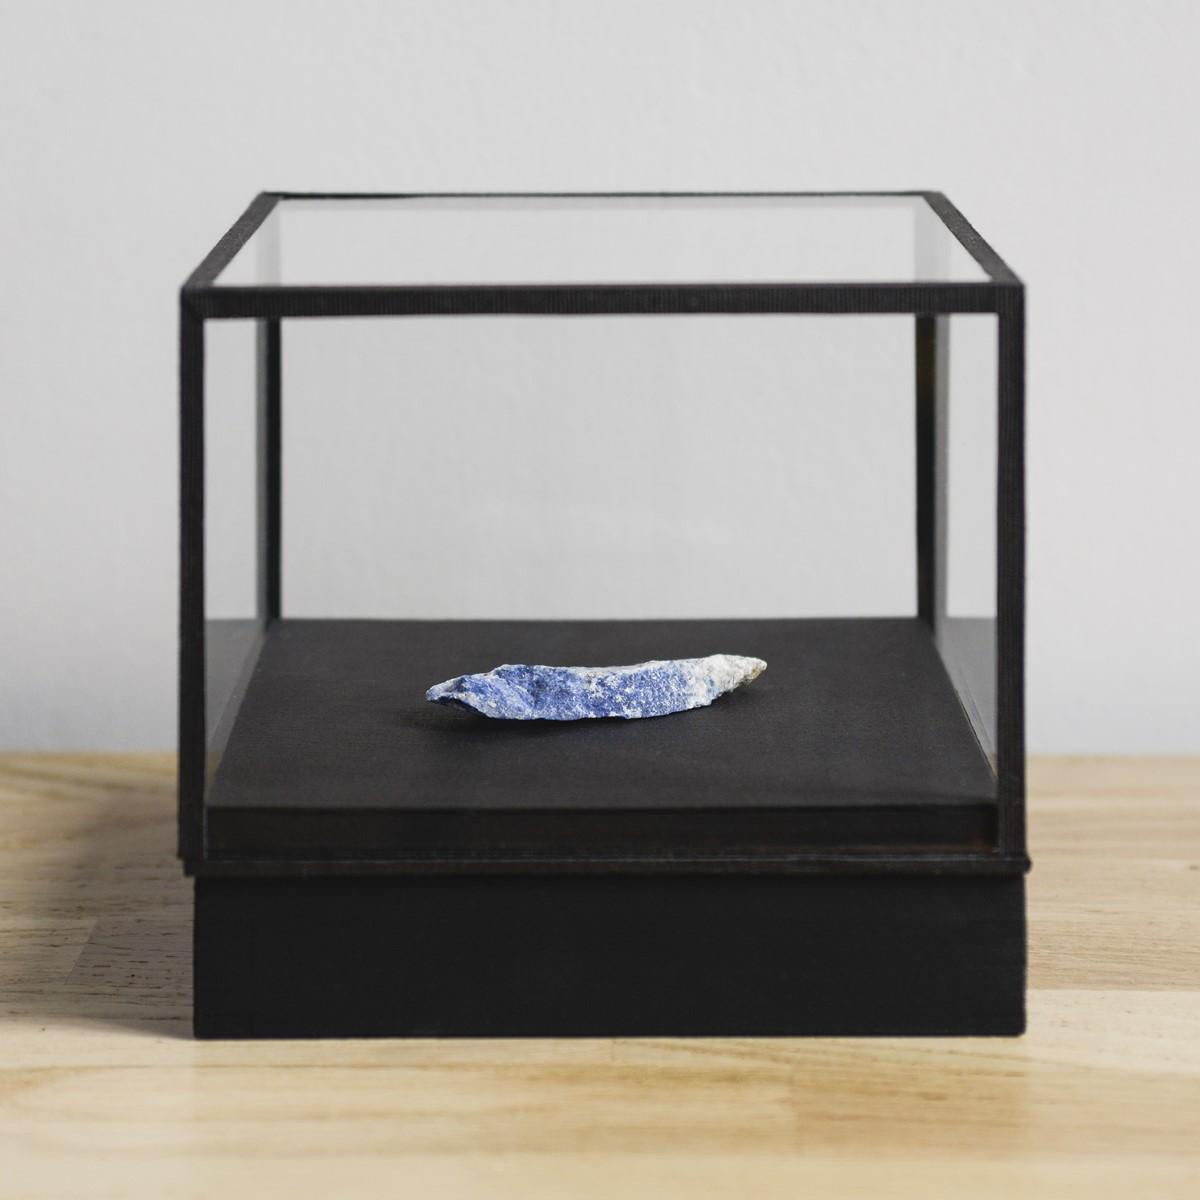 PROTEE-PIERRES-Lapis-Lazuli_ARF0357 [1600x1200]